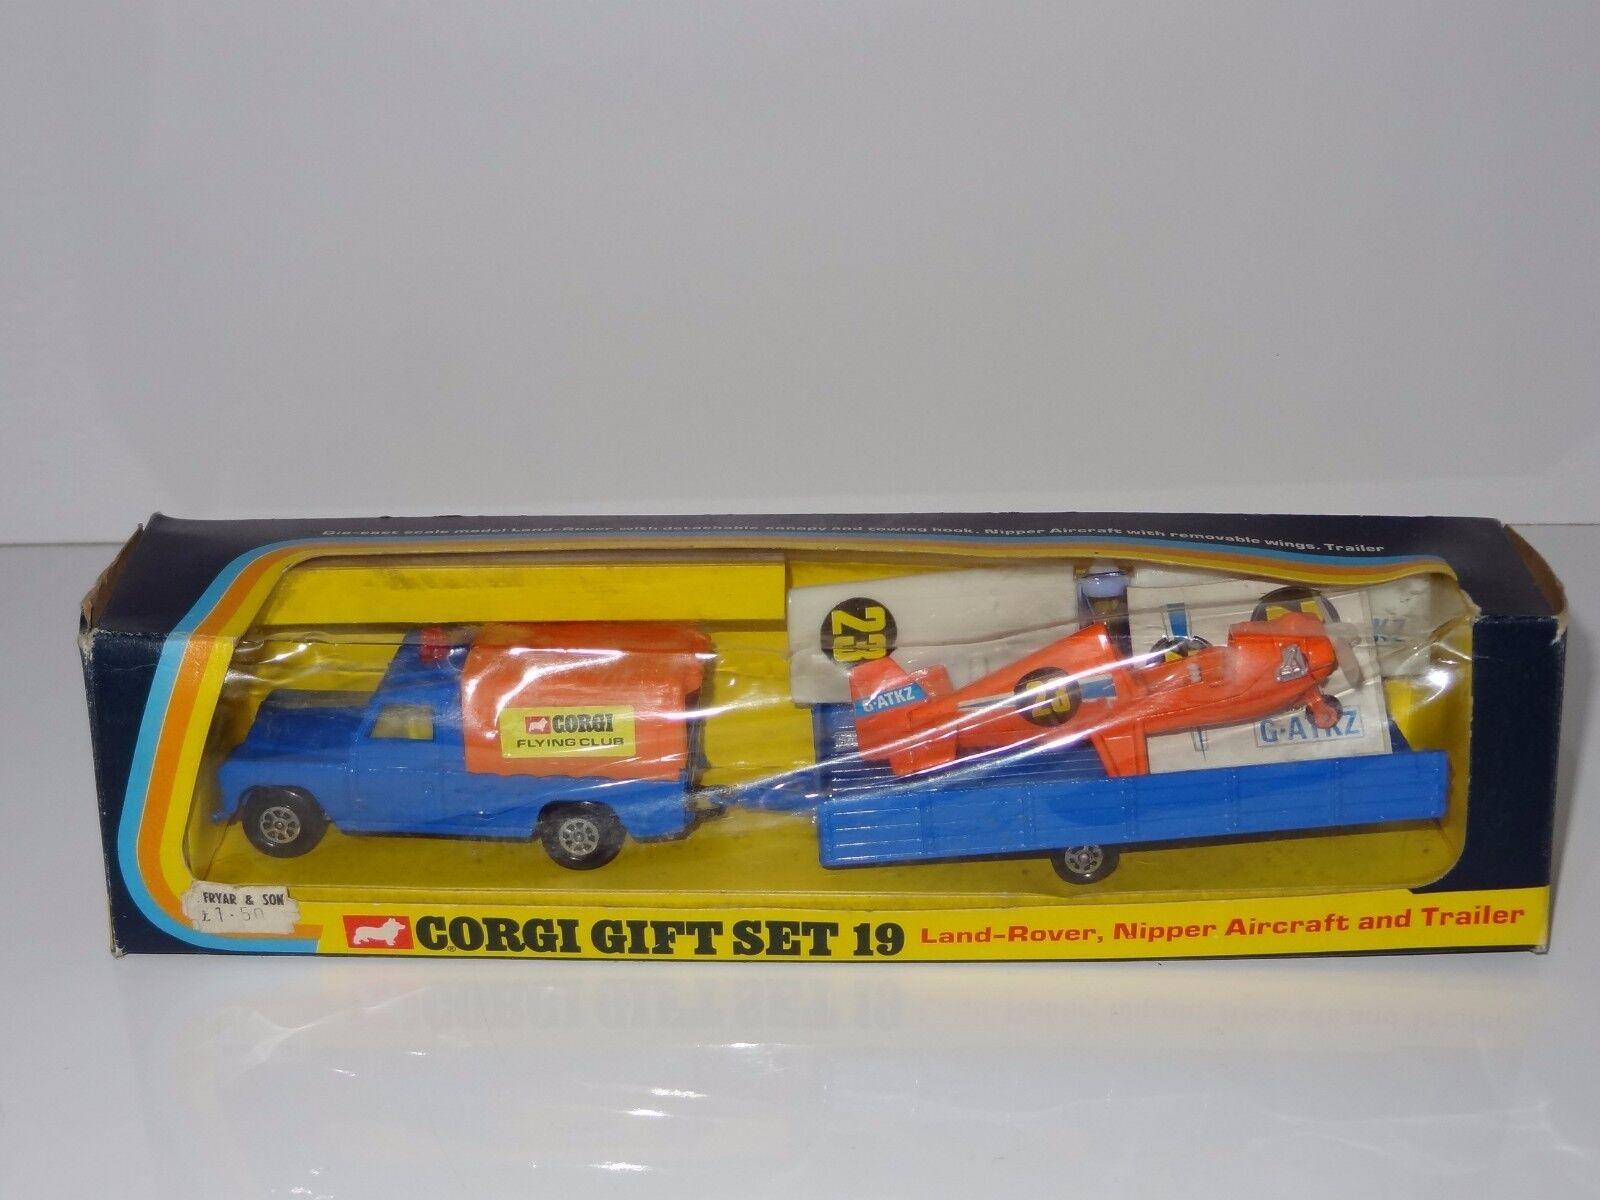 (vt) Corgi Giftset GS 19 LAND ROVER WITH NIPPER AIRCRAFT FLYING CLUB